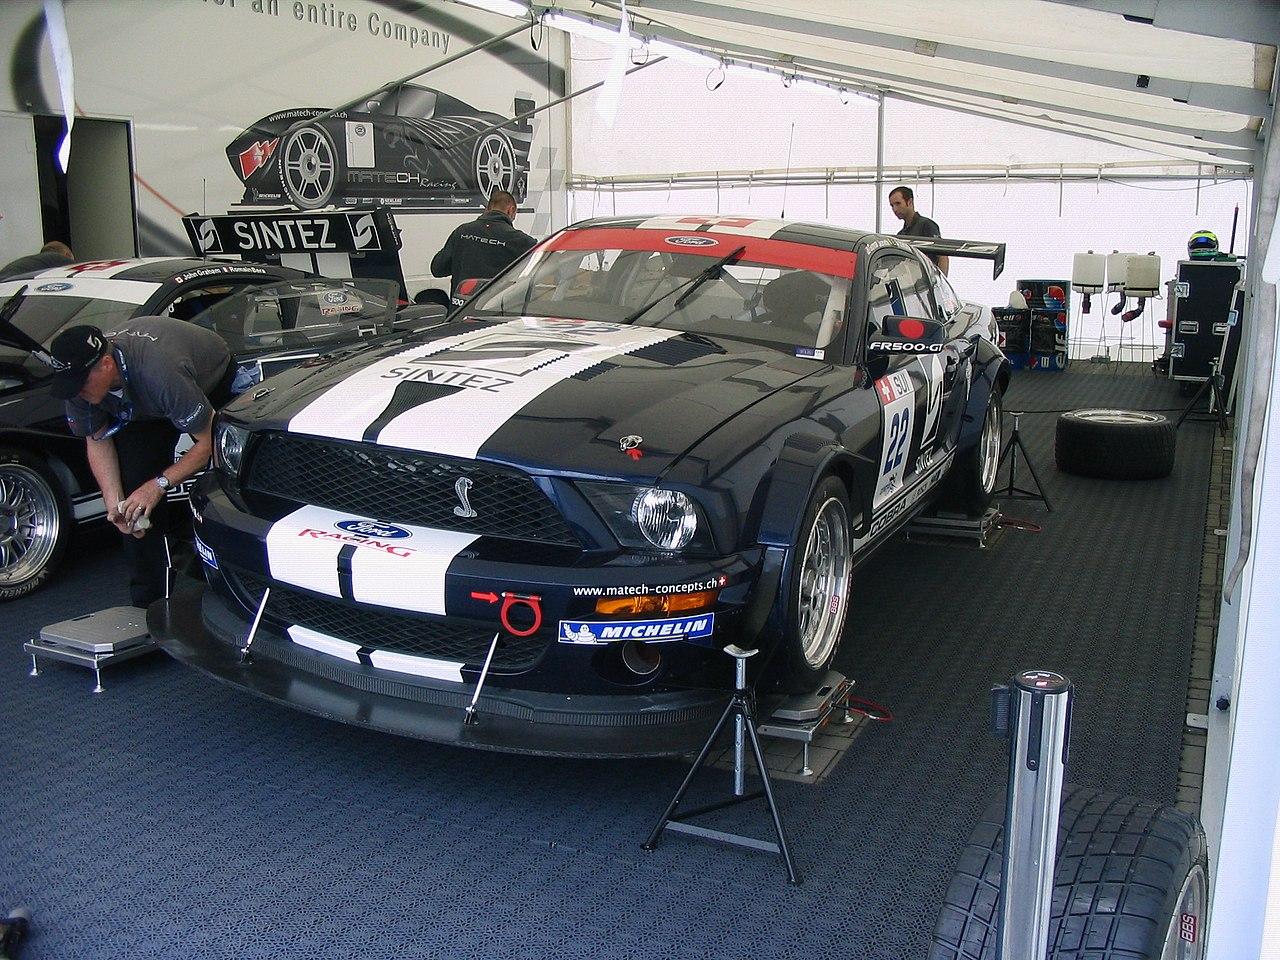 [Image: 1280px-Ford_Mustang_FR500GT_Nr22_Oschersleben2008.jpg]